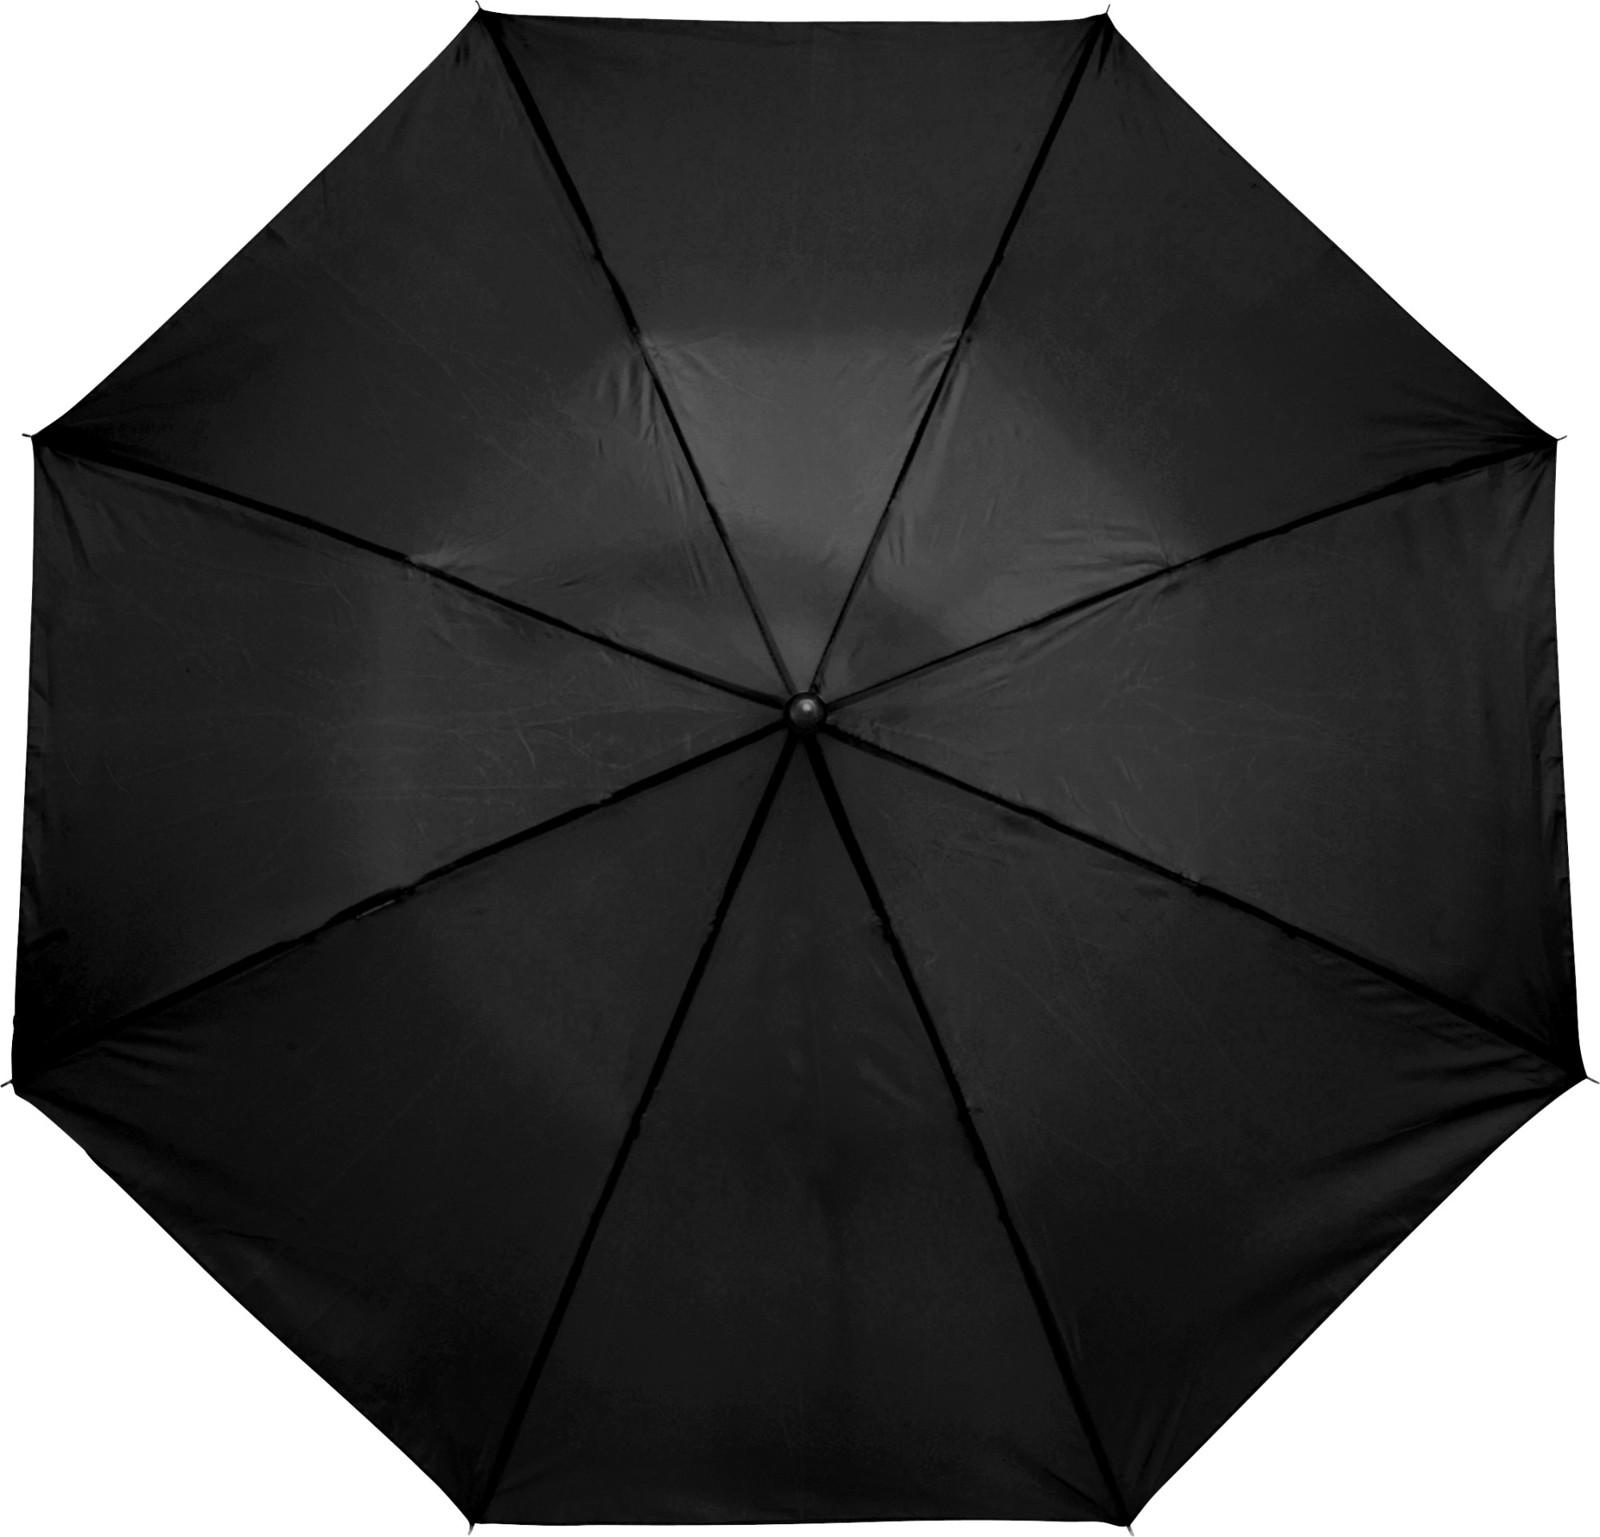 Polyester (190T) umbrella - Black